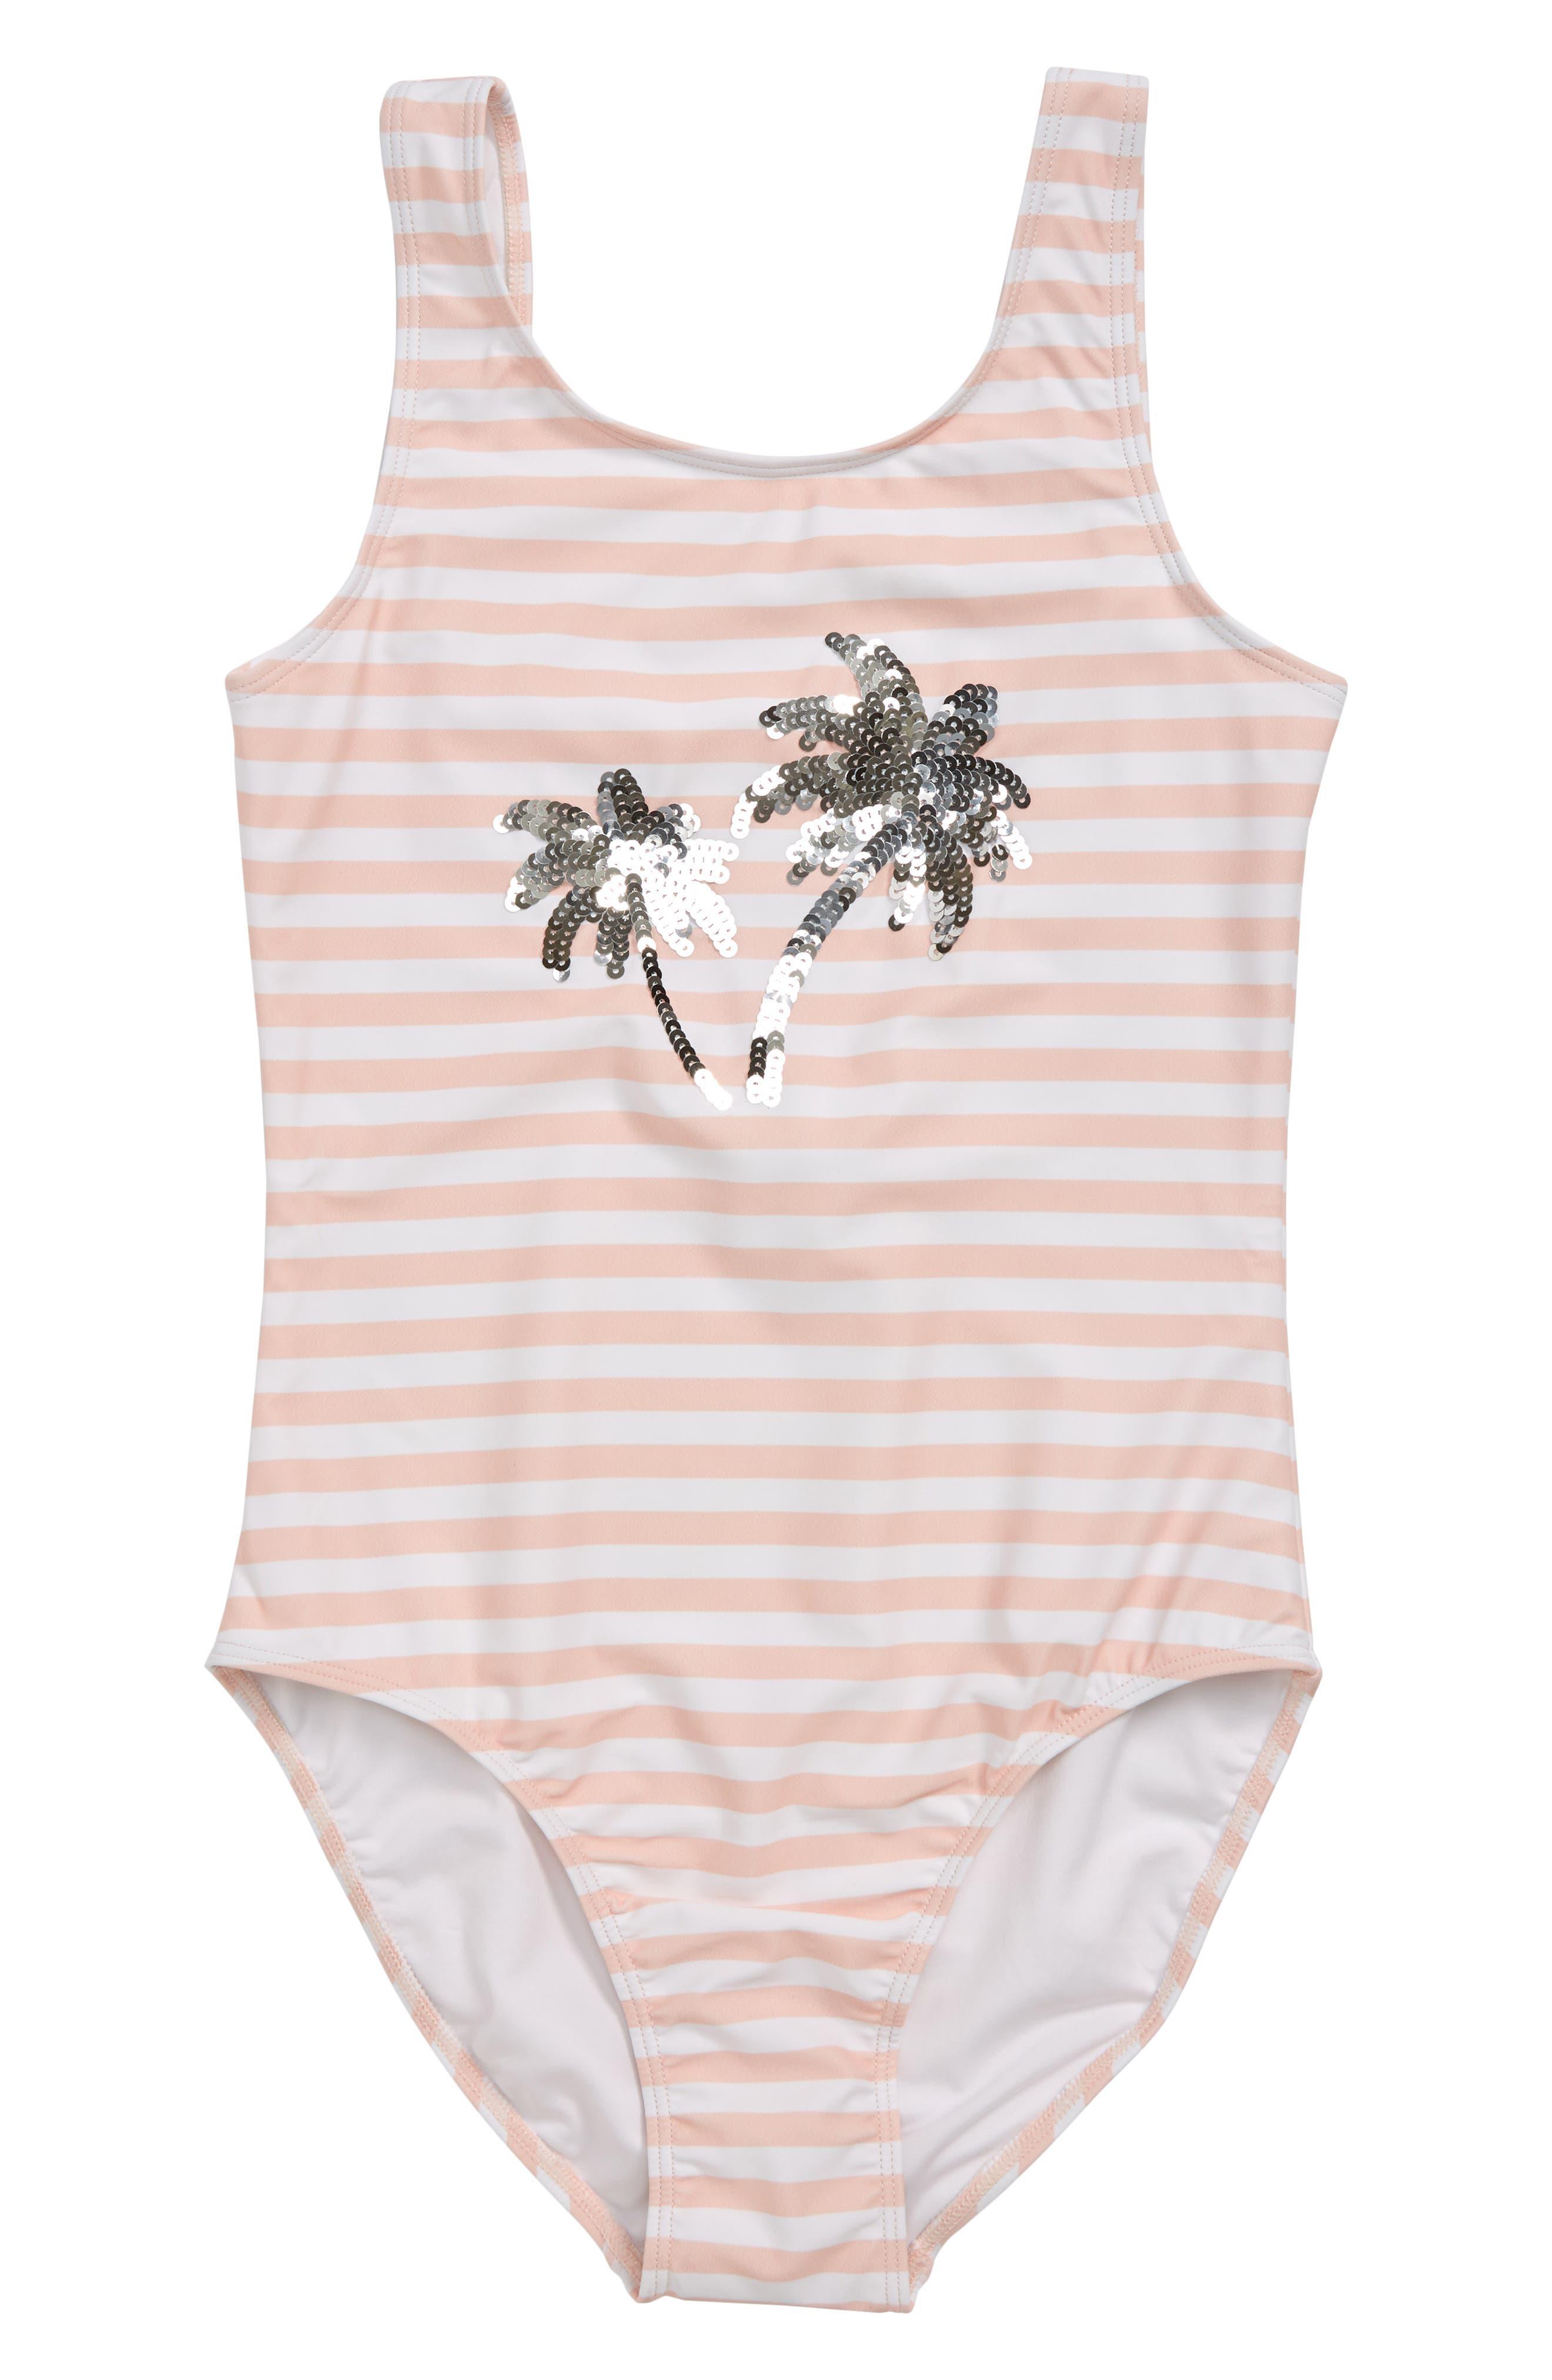 Girls Tucker  Tate Sequins OnePiece Swimsuit